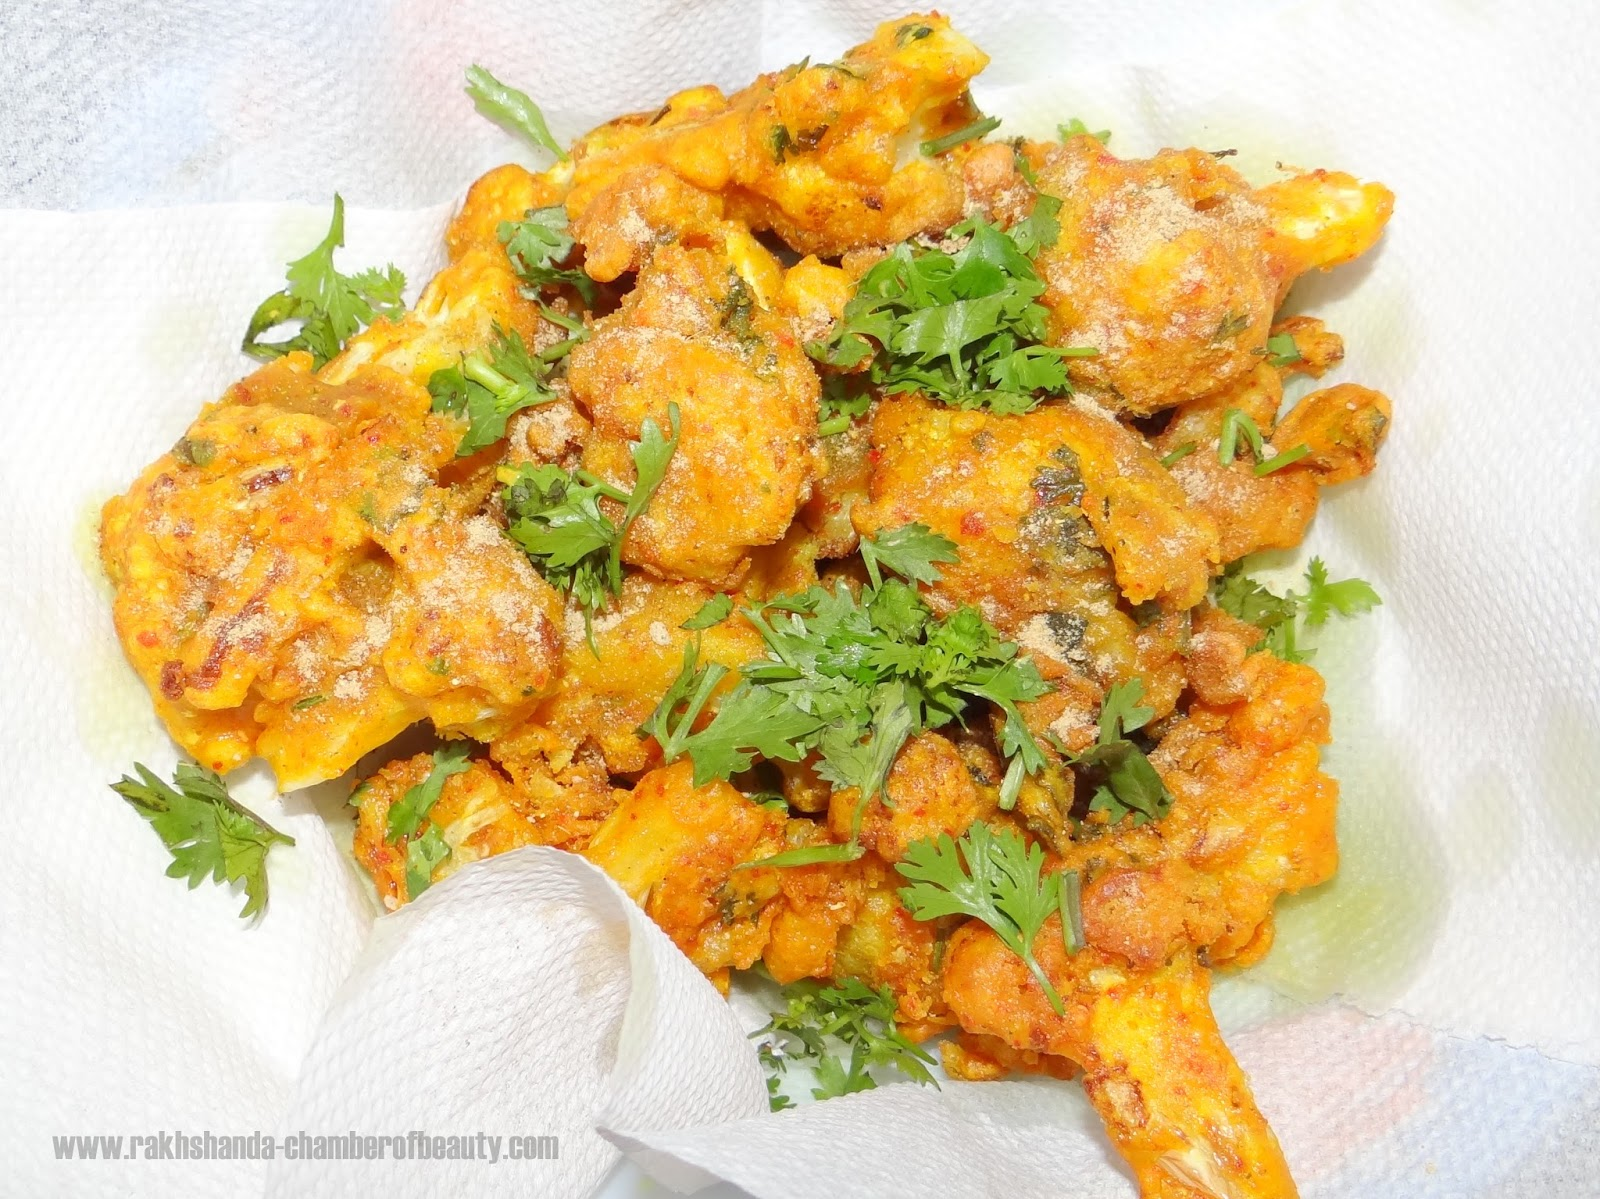 Spicy Indian Gobi(Cauliflower) Fry recipe